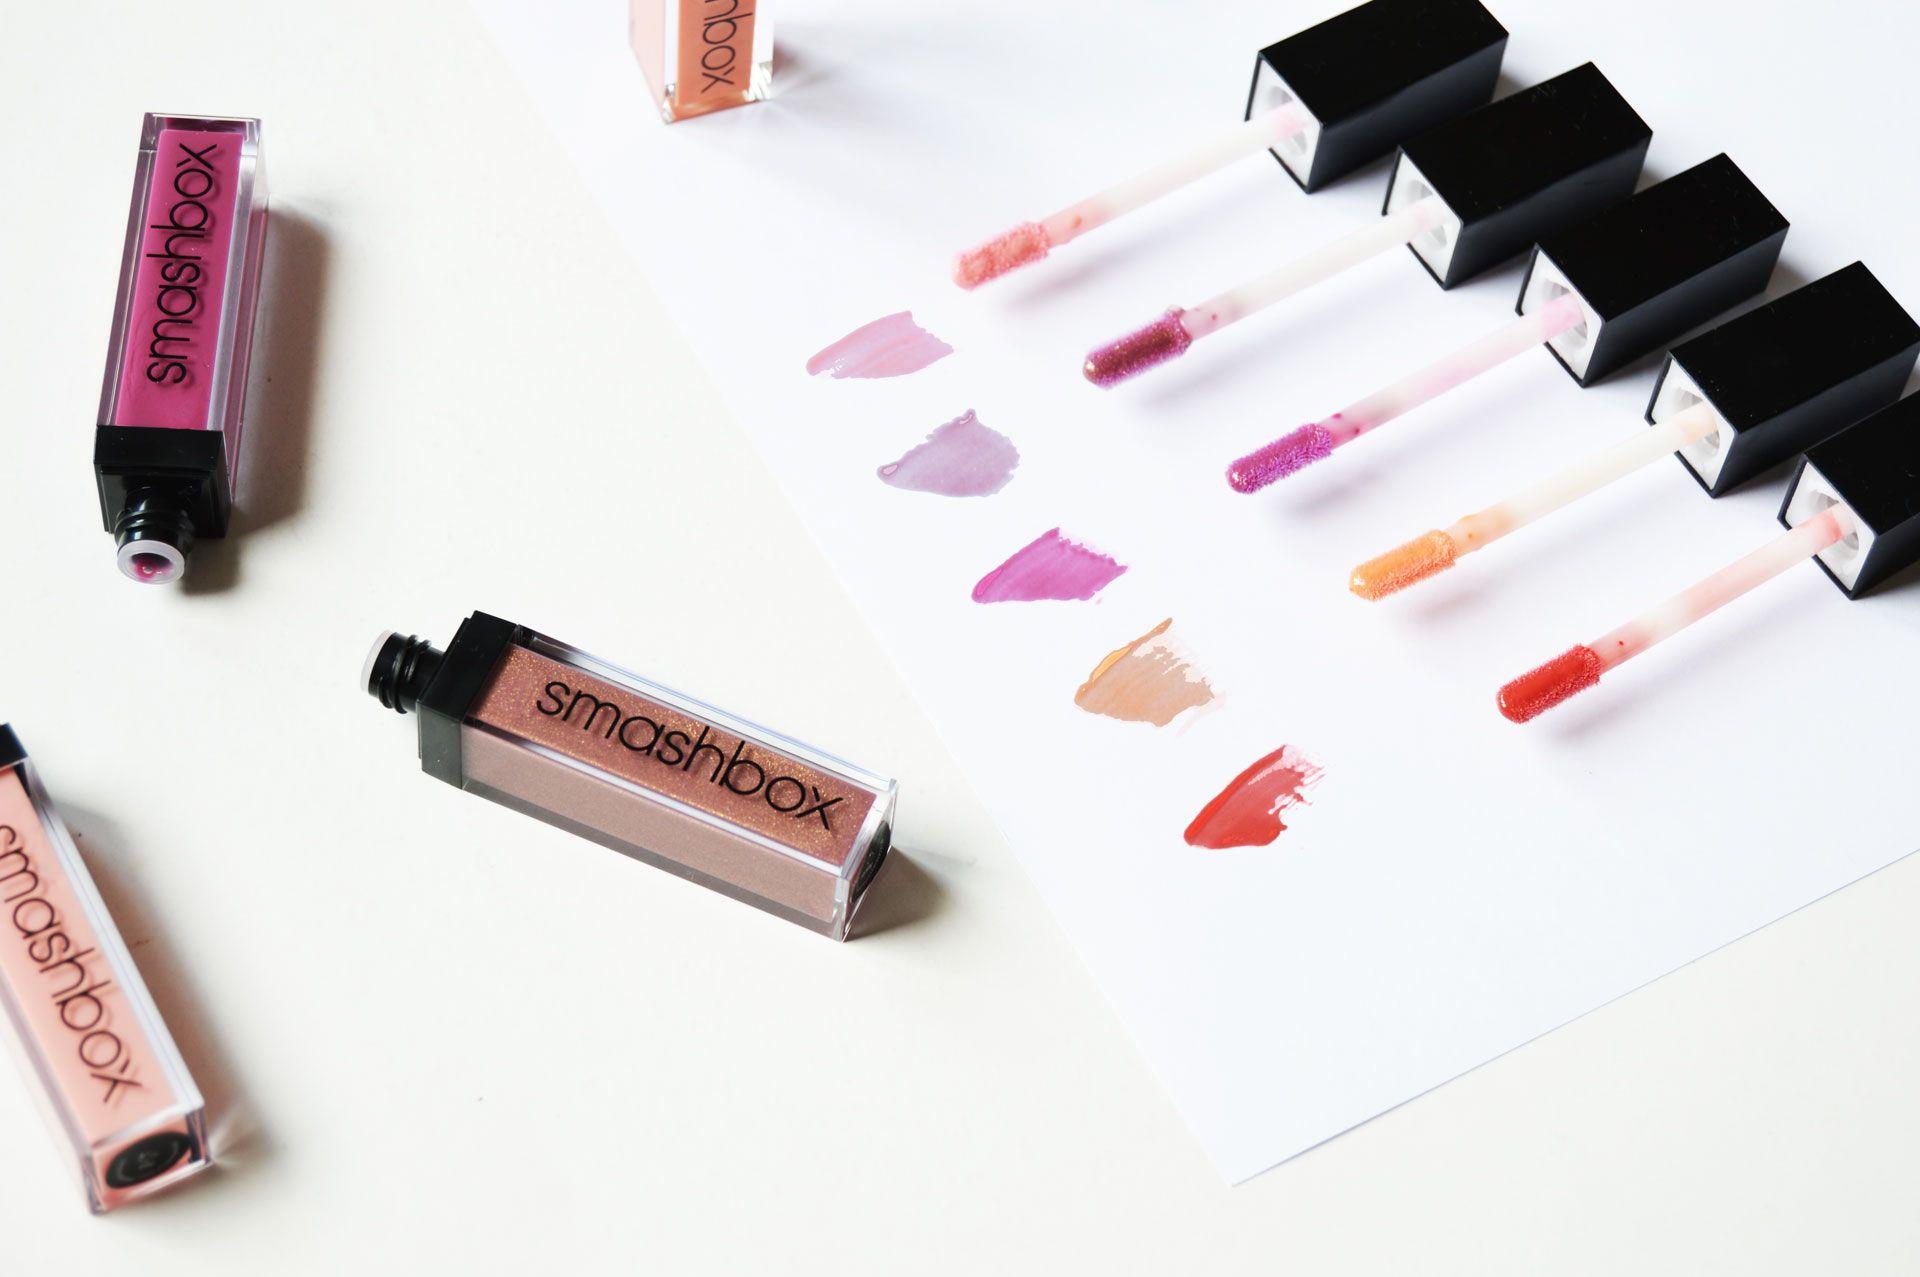 Smashbox Be Legendary Lip Gloss Swatches